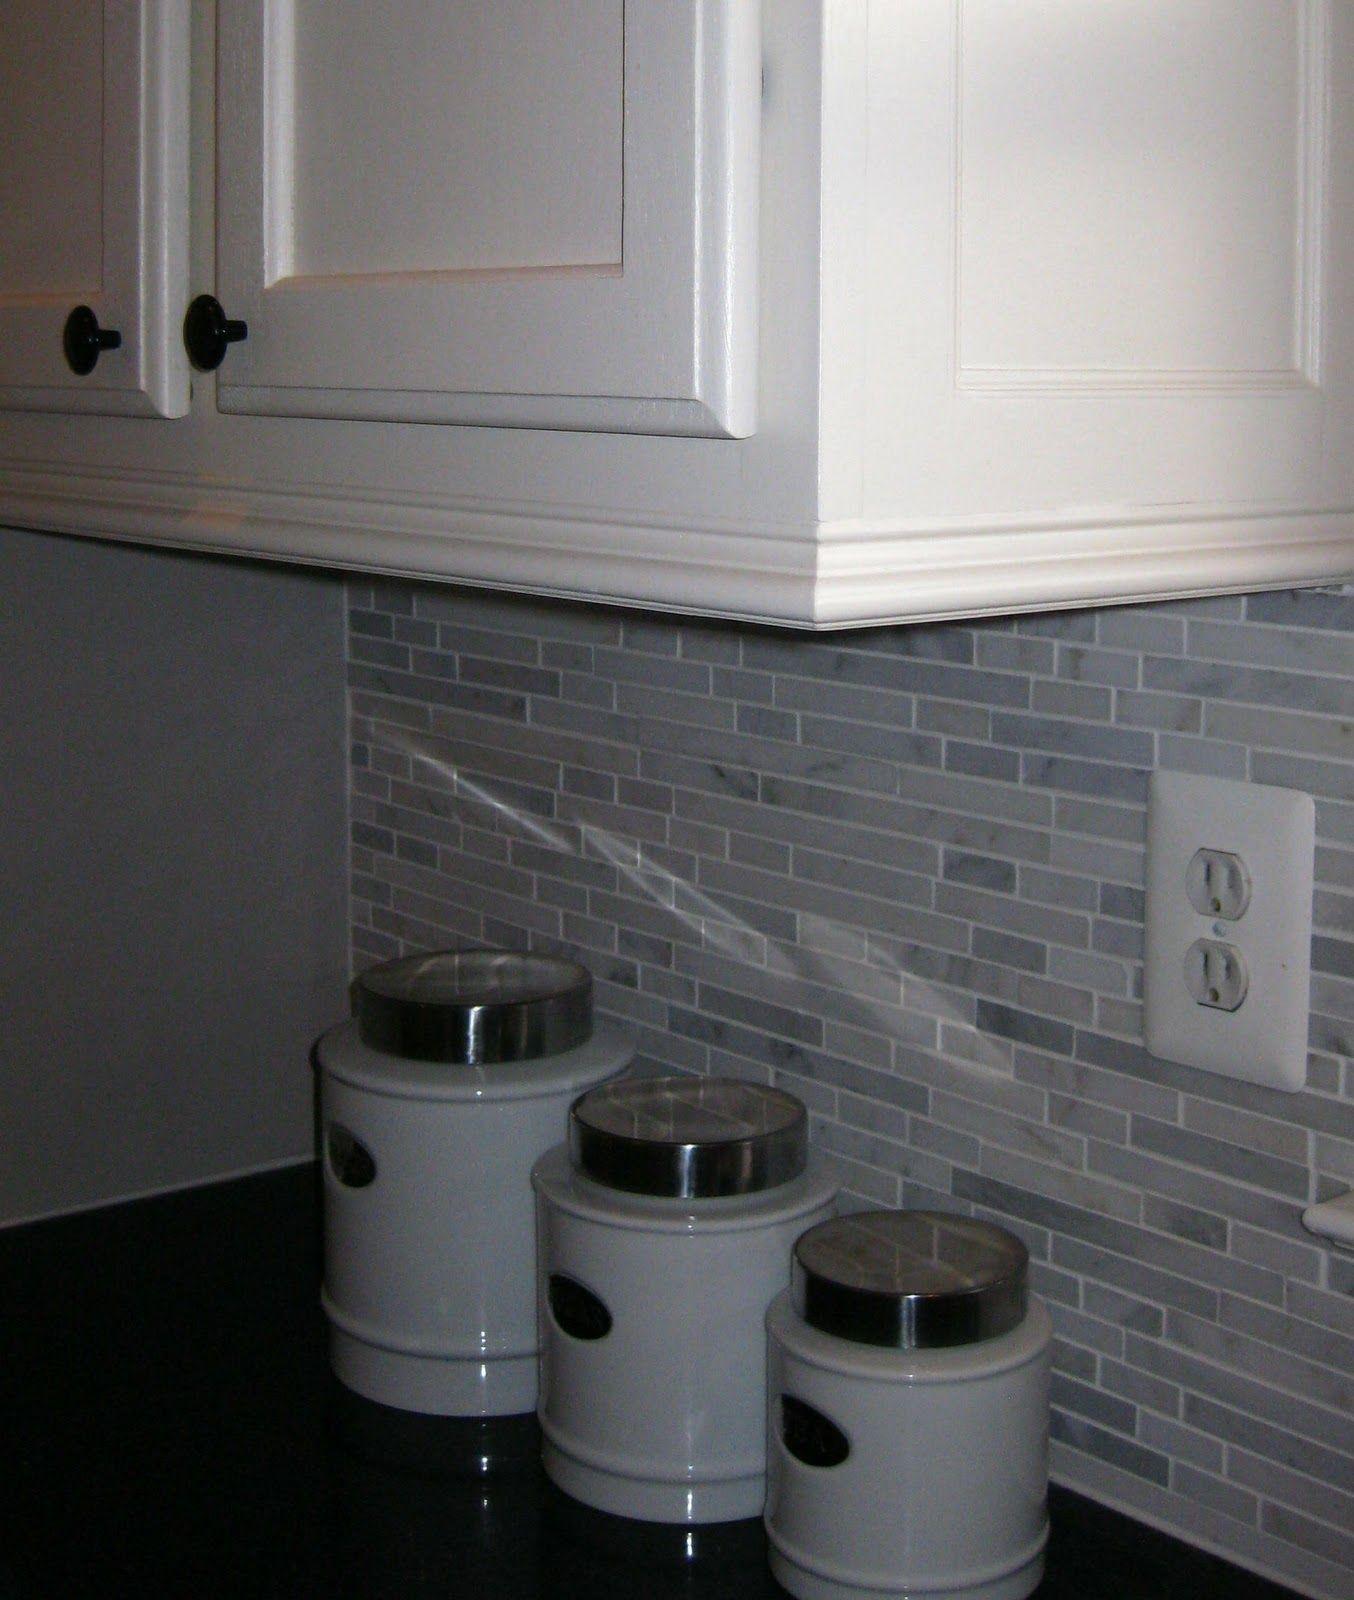 ideas about kitchen cabinet molding on pinterest cabinet molding crown moldings and door molding: kitchen moldings